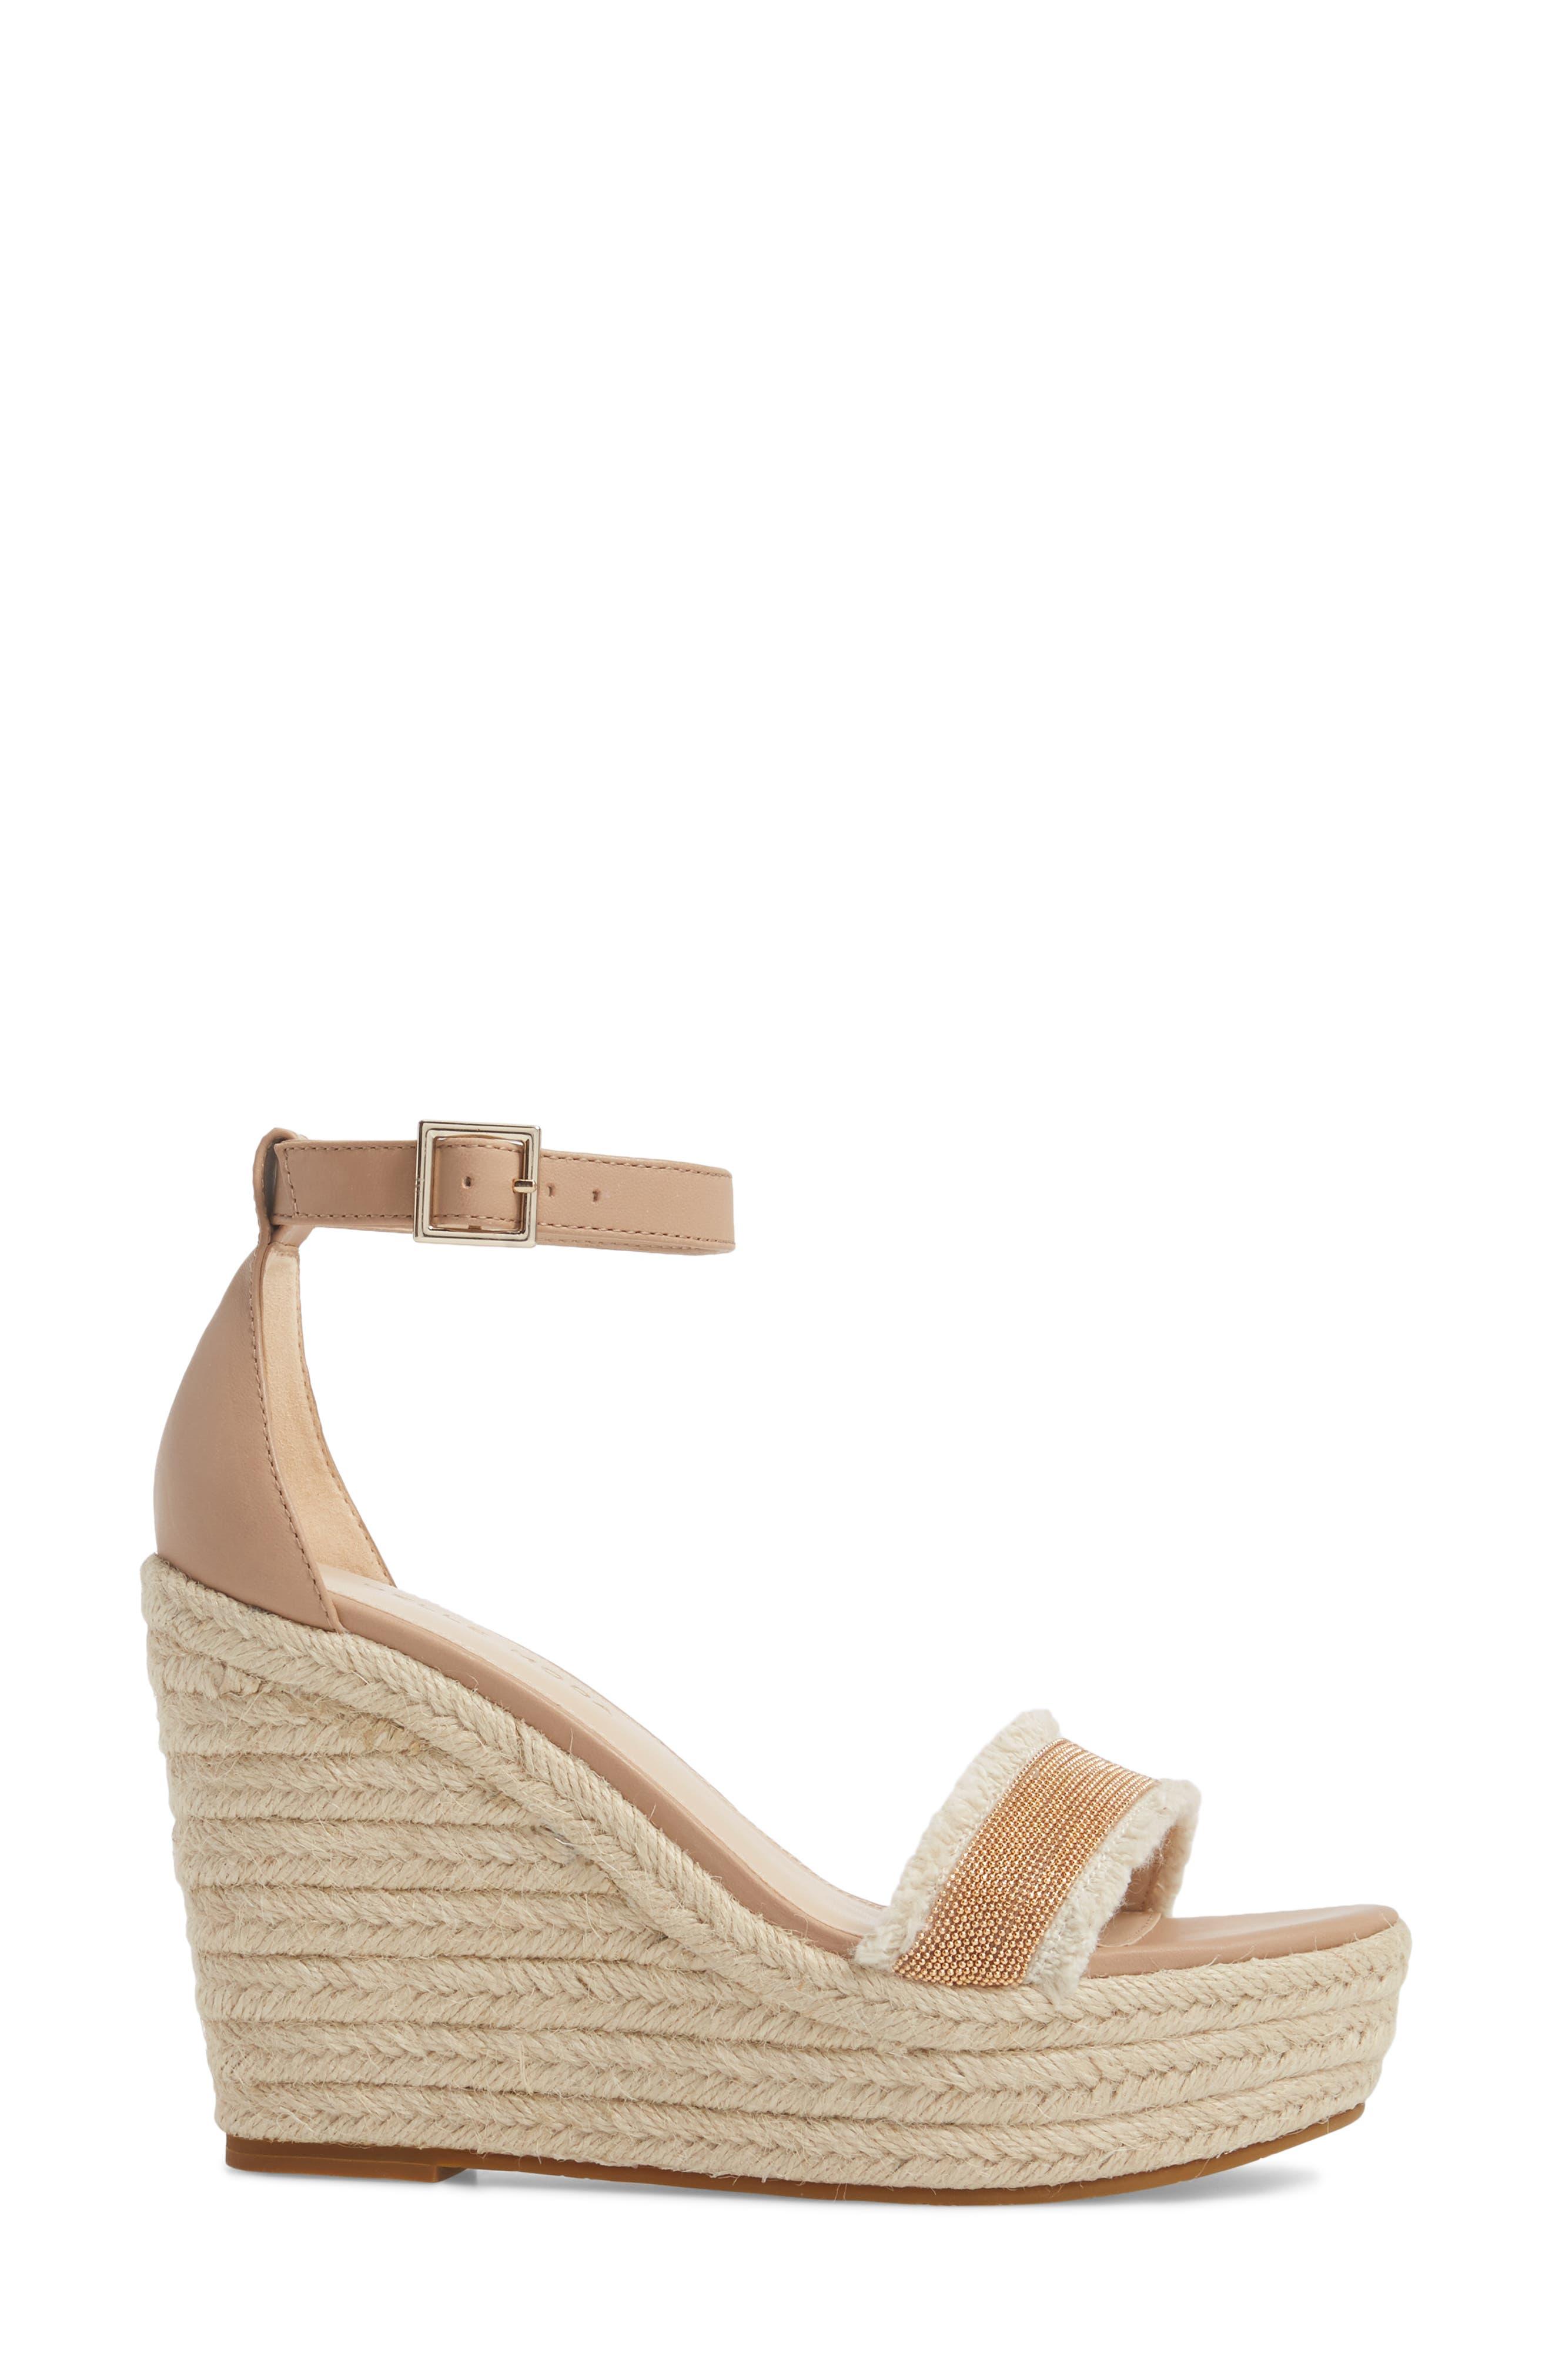 Radley Espadrille Wedge Sandal,                             Alternate thumbnail 3, color,                             Sand Leather